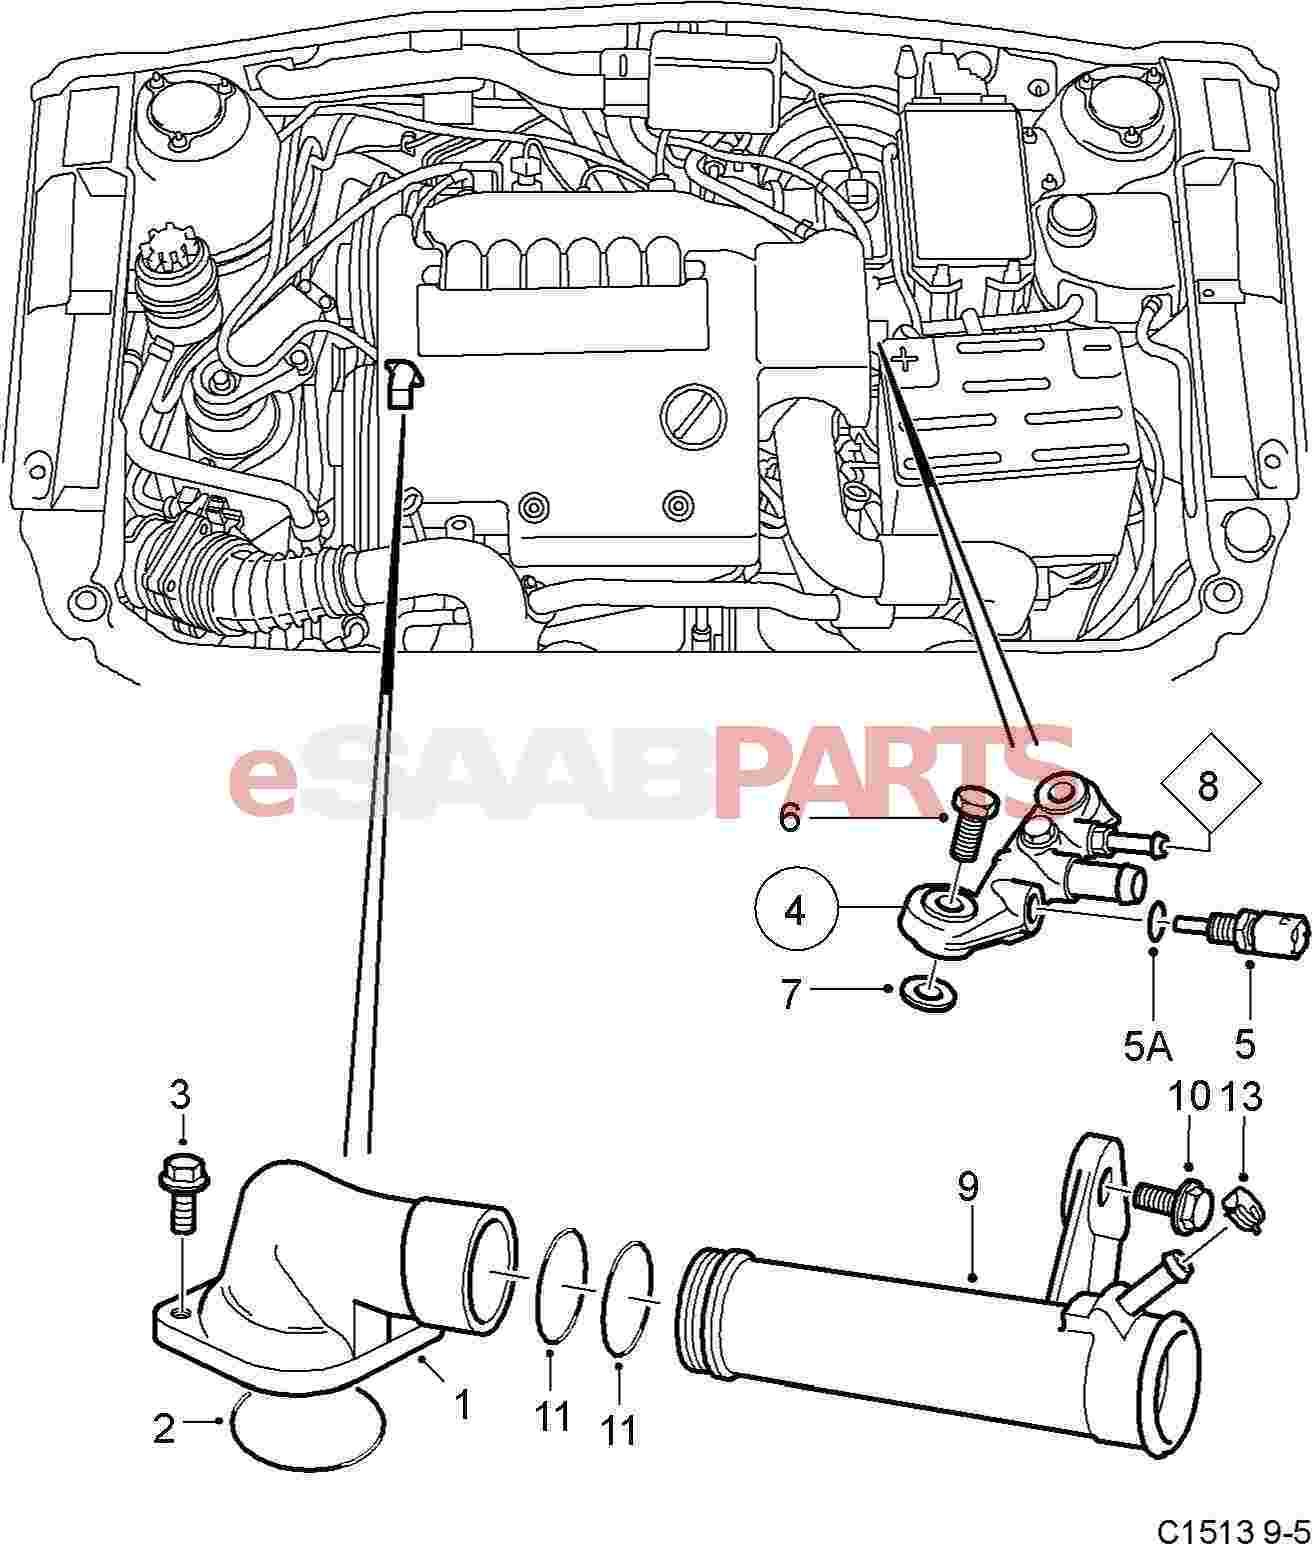 Saab 9 5 Engine Diagram Saab 9 5 Detailing Washing